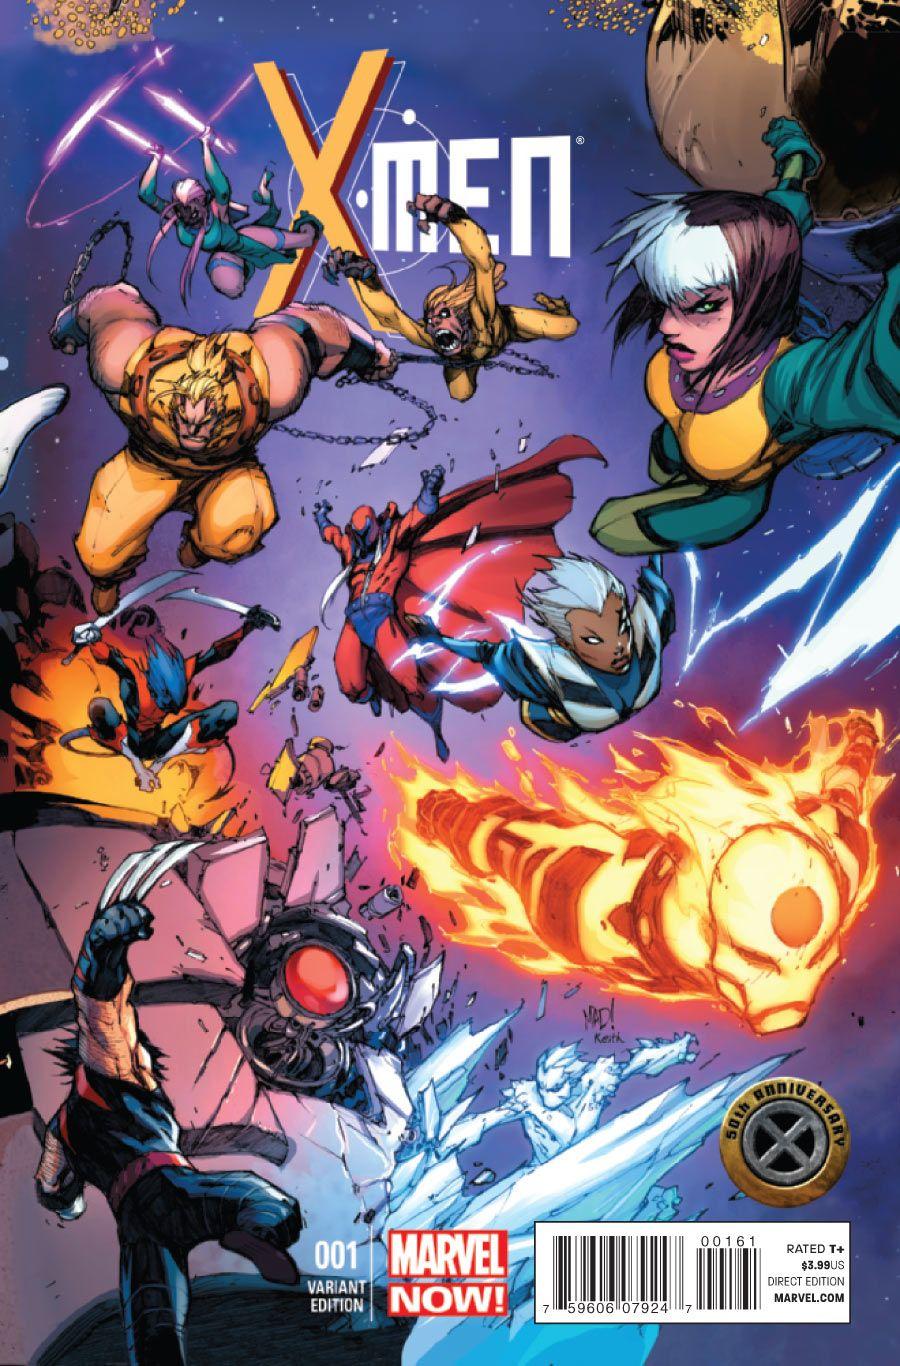 Preview X Men 1 Page 1 Of 8 Joe Madureira Marvel Comics Art Comics